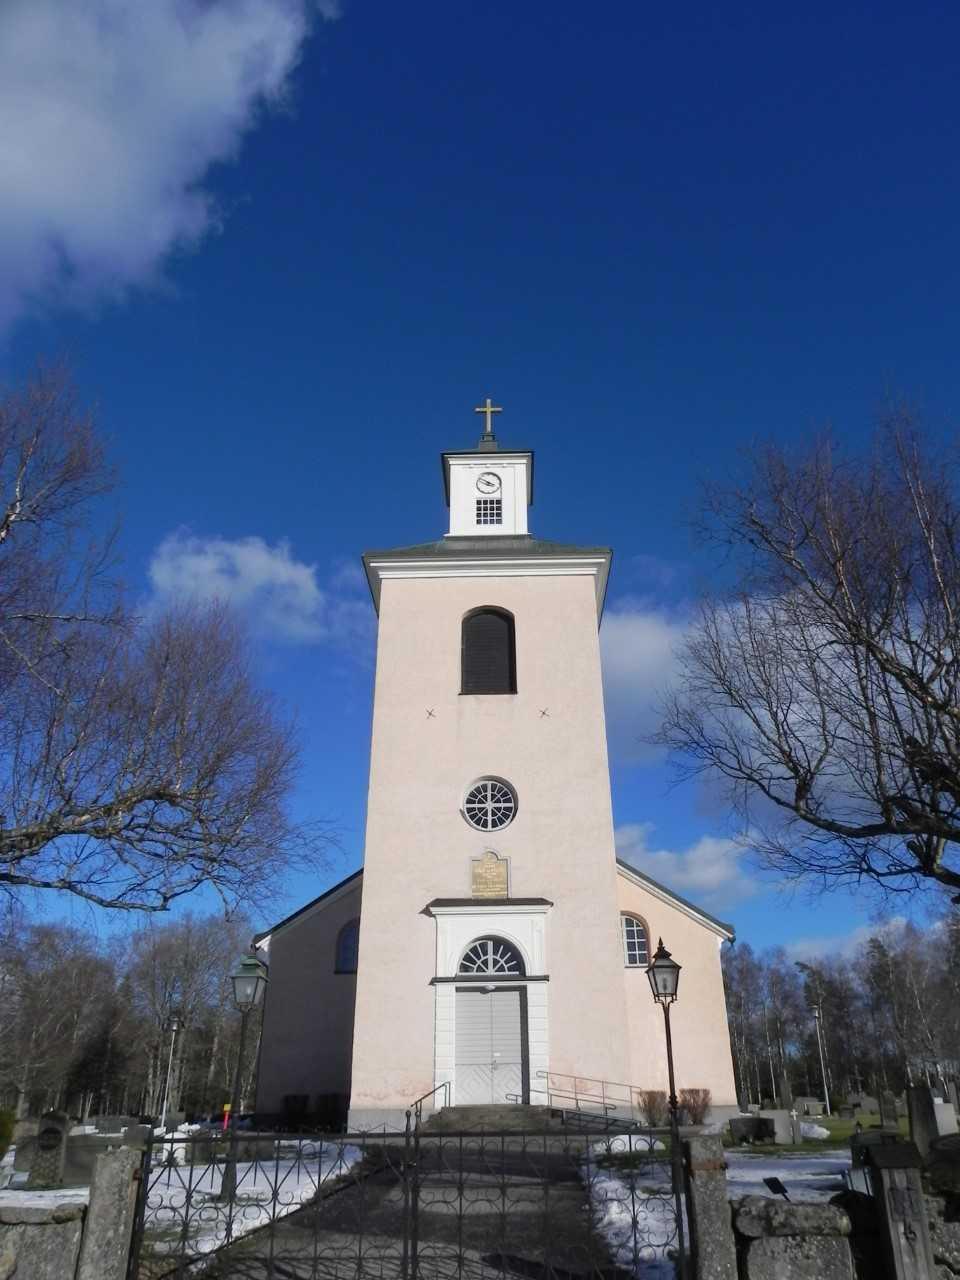 Hallaryds kyrka